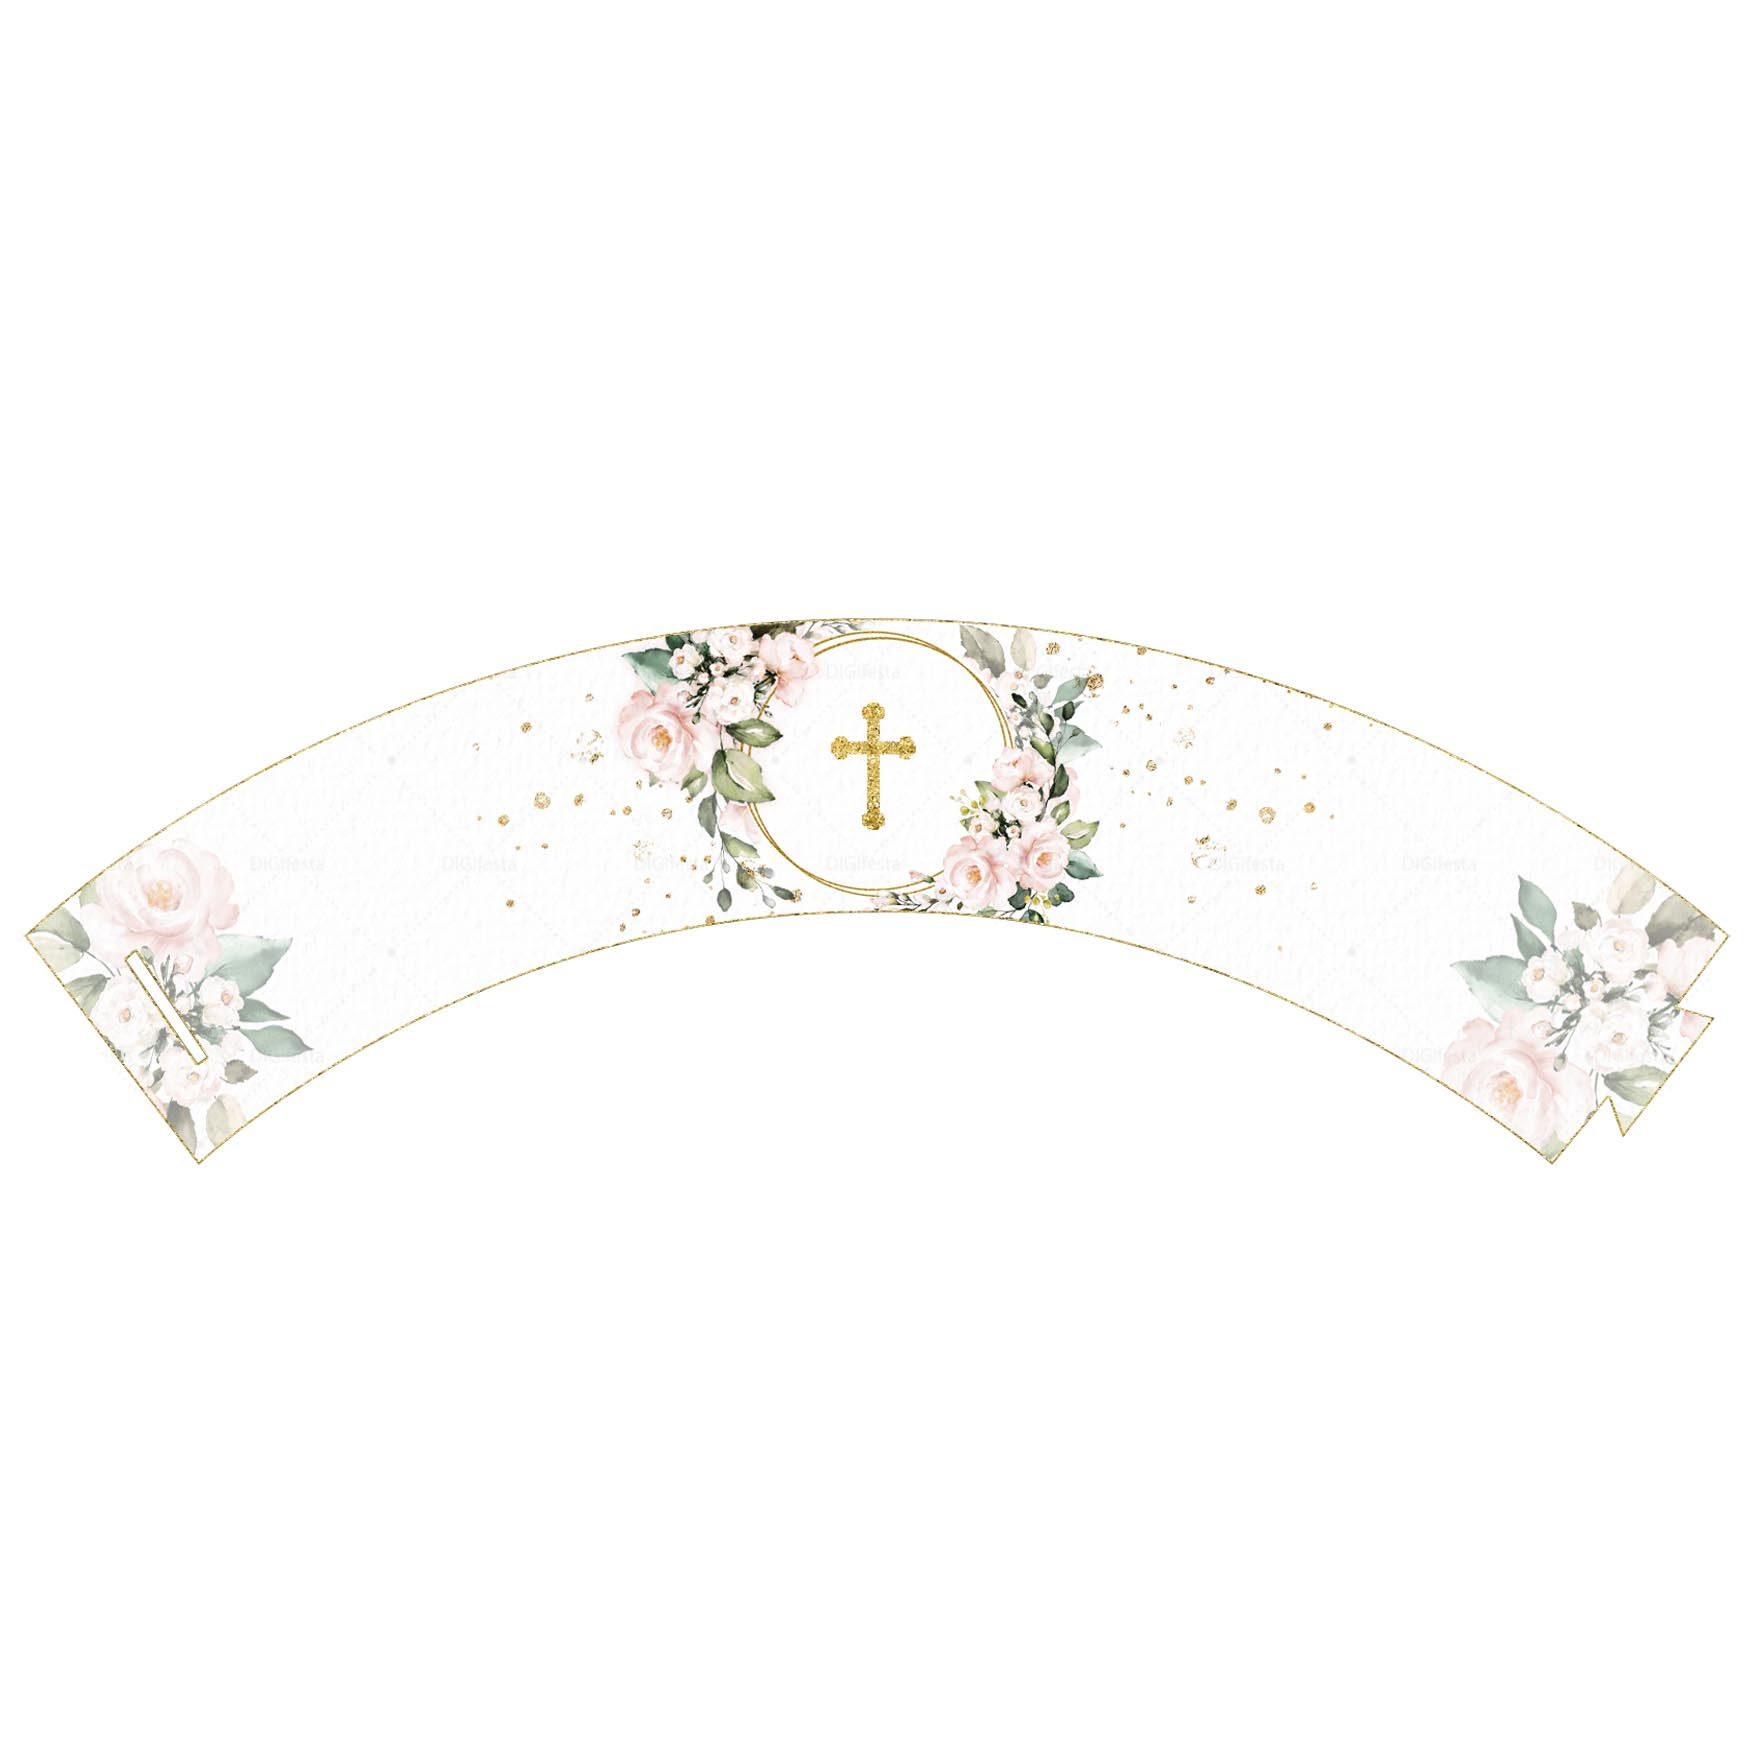 Saia de Cupcake Glitter Floral Grátis